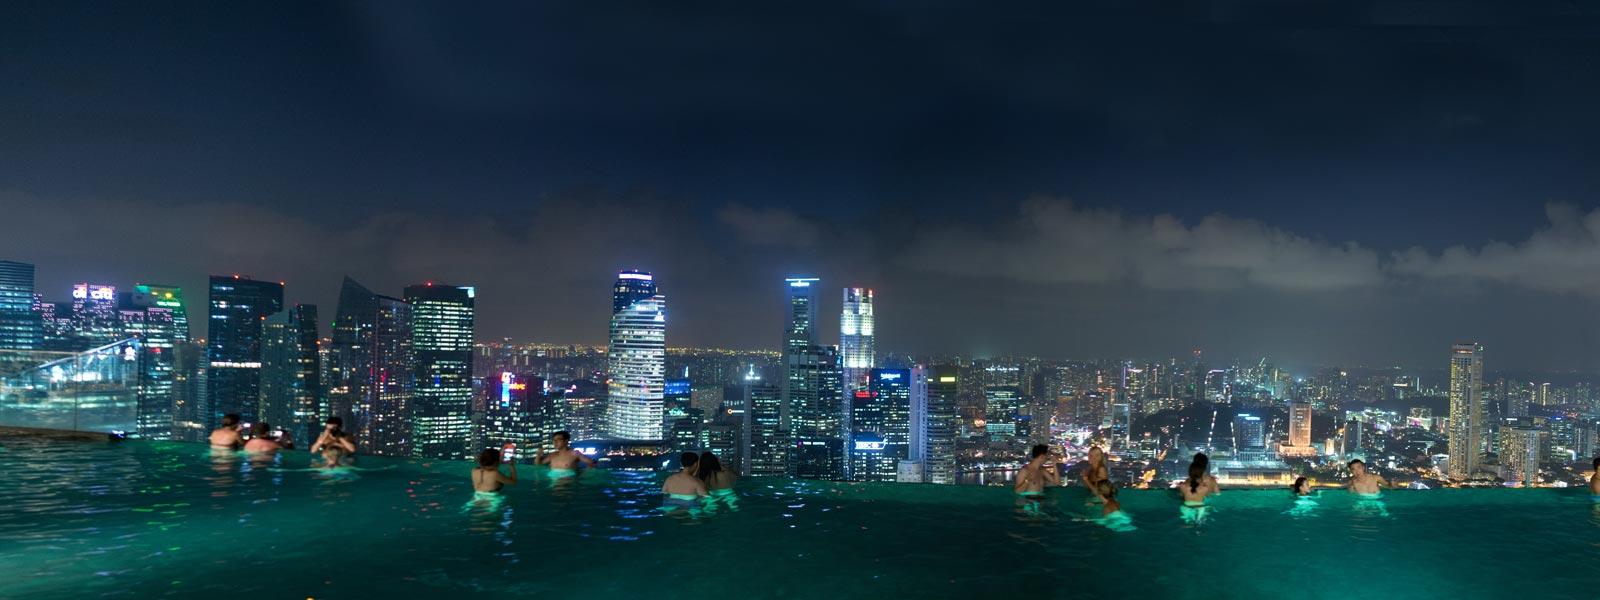 reiseblog singapur marina bay sands infinity pool. Black Bedroom Furniture Sets. Home Design Ideas